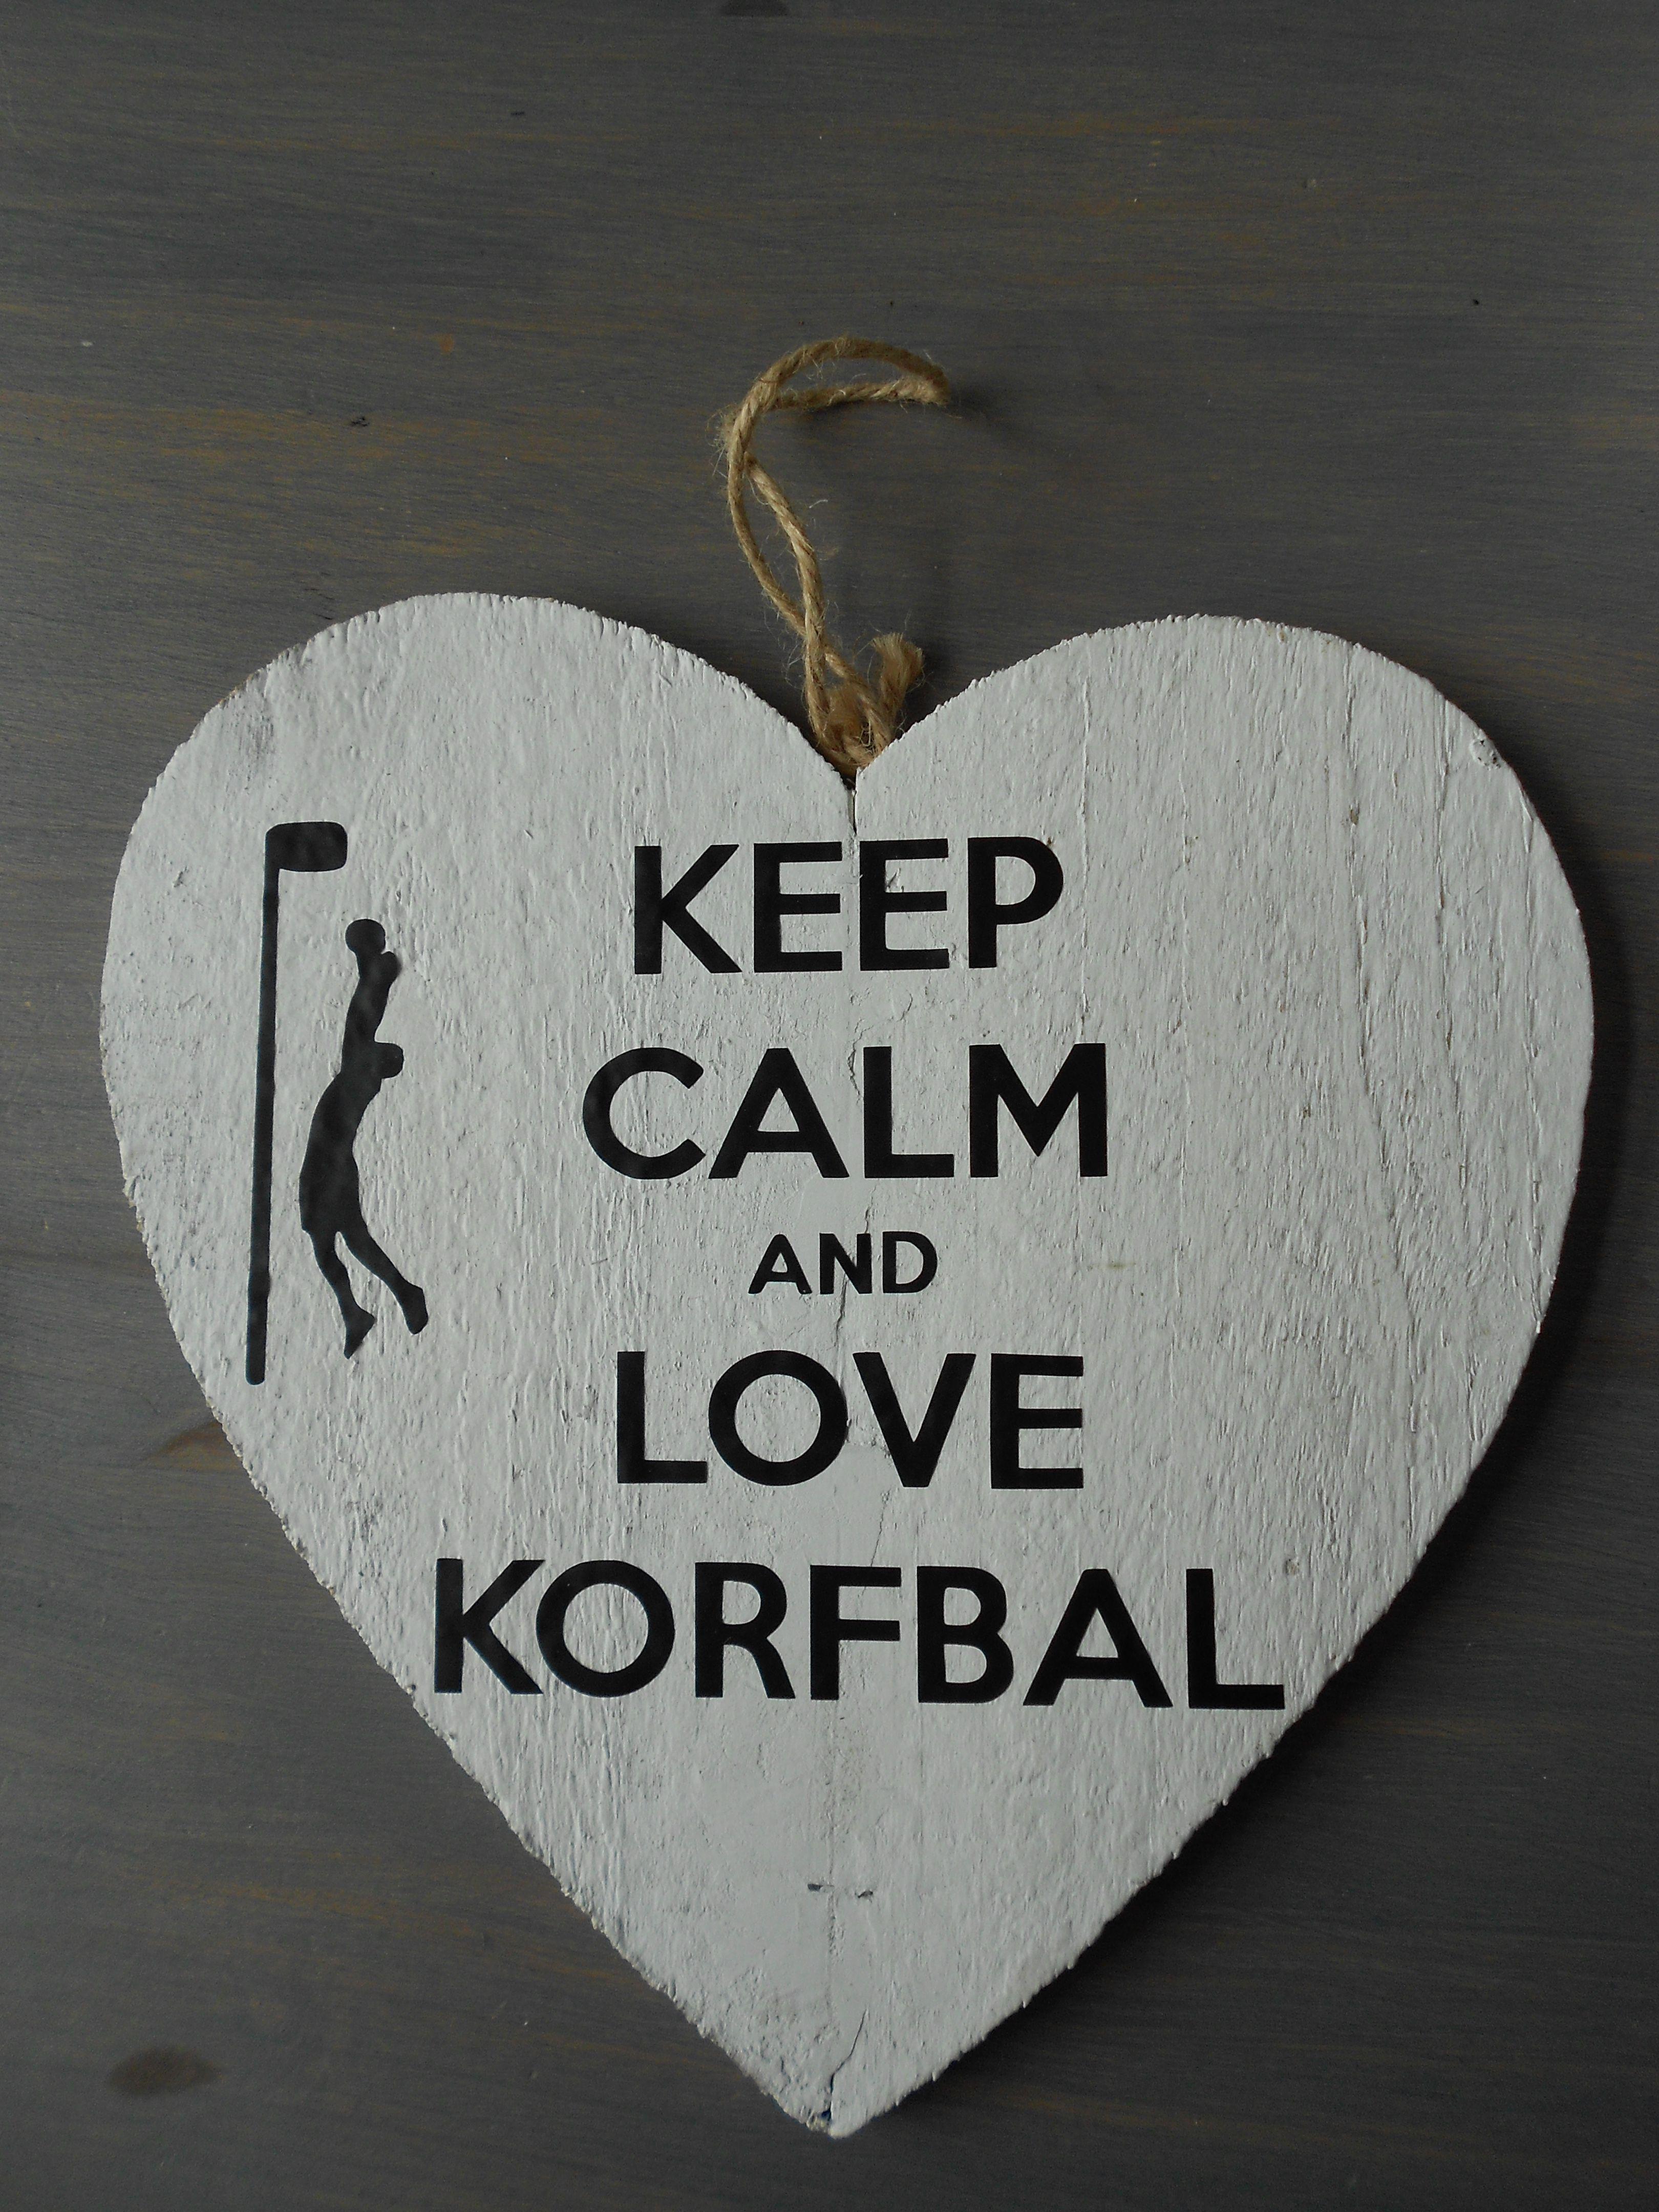 Citaten Grappig Cadeau : Keep calm and love korfbal cadeautje voor de trainers als